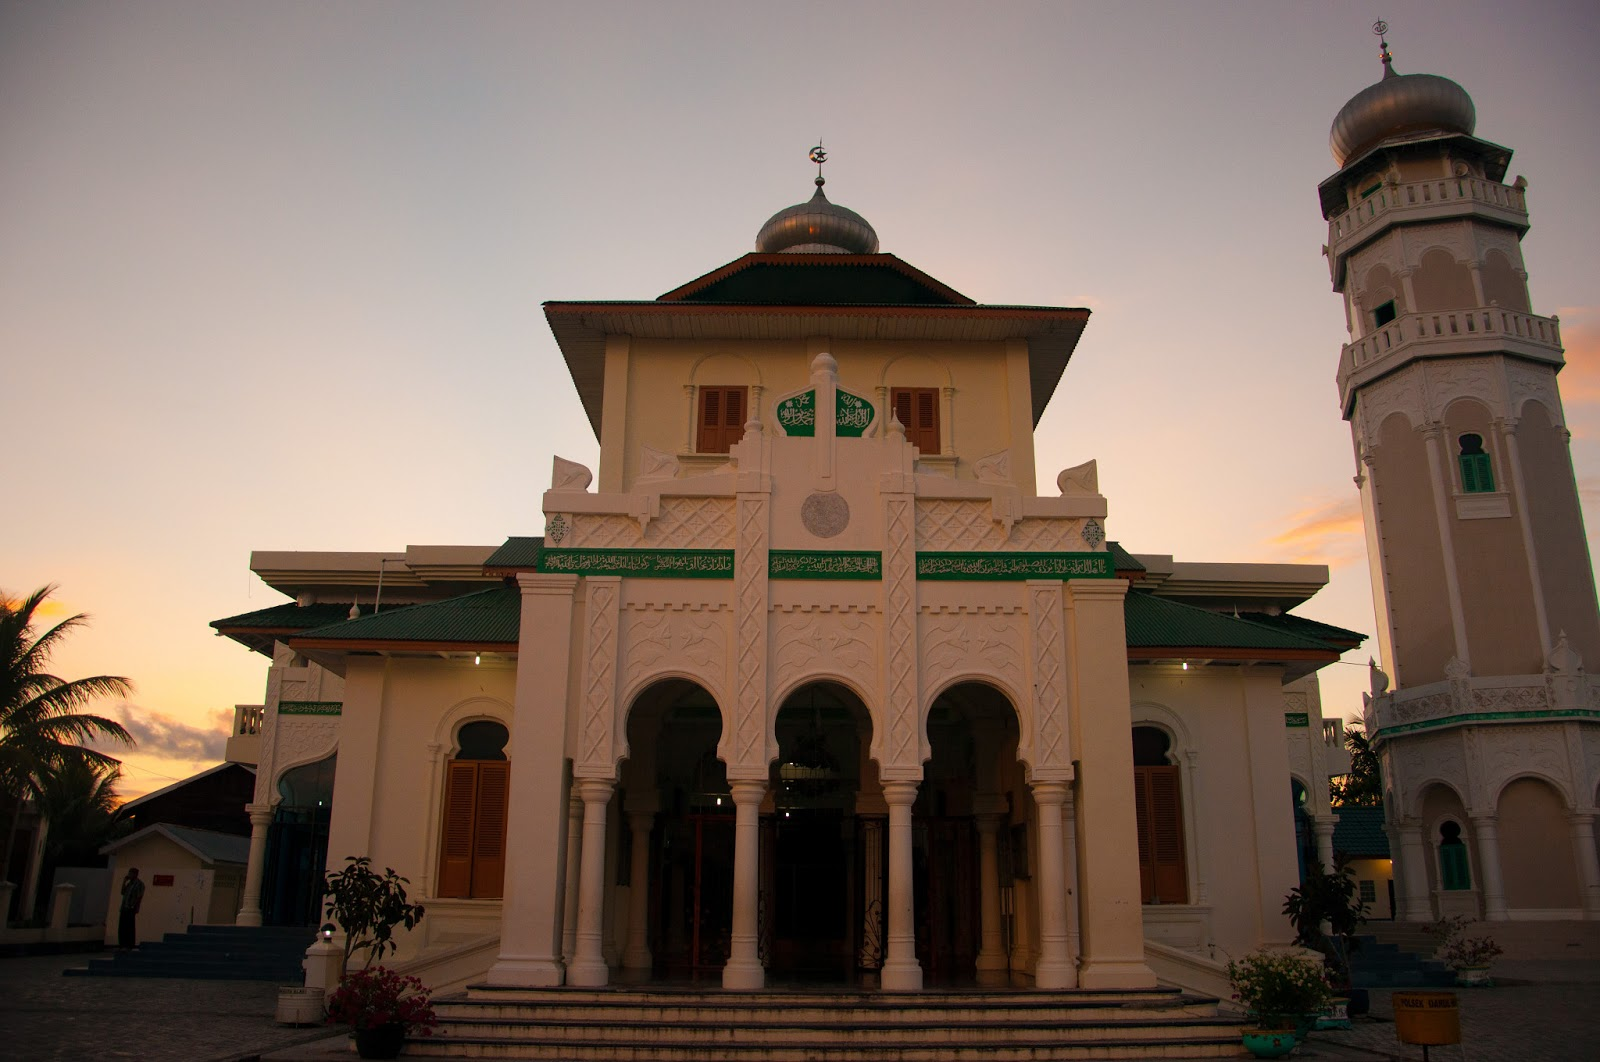 Poundja Putra Atjeh Masjid Baiturrahim Ulee Lheu Banda Aceh Lheue